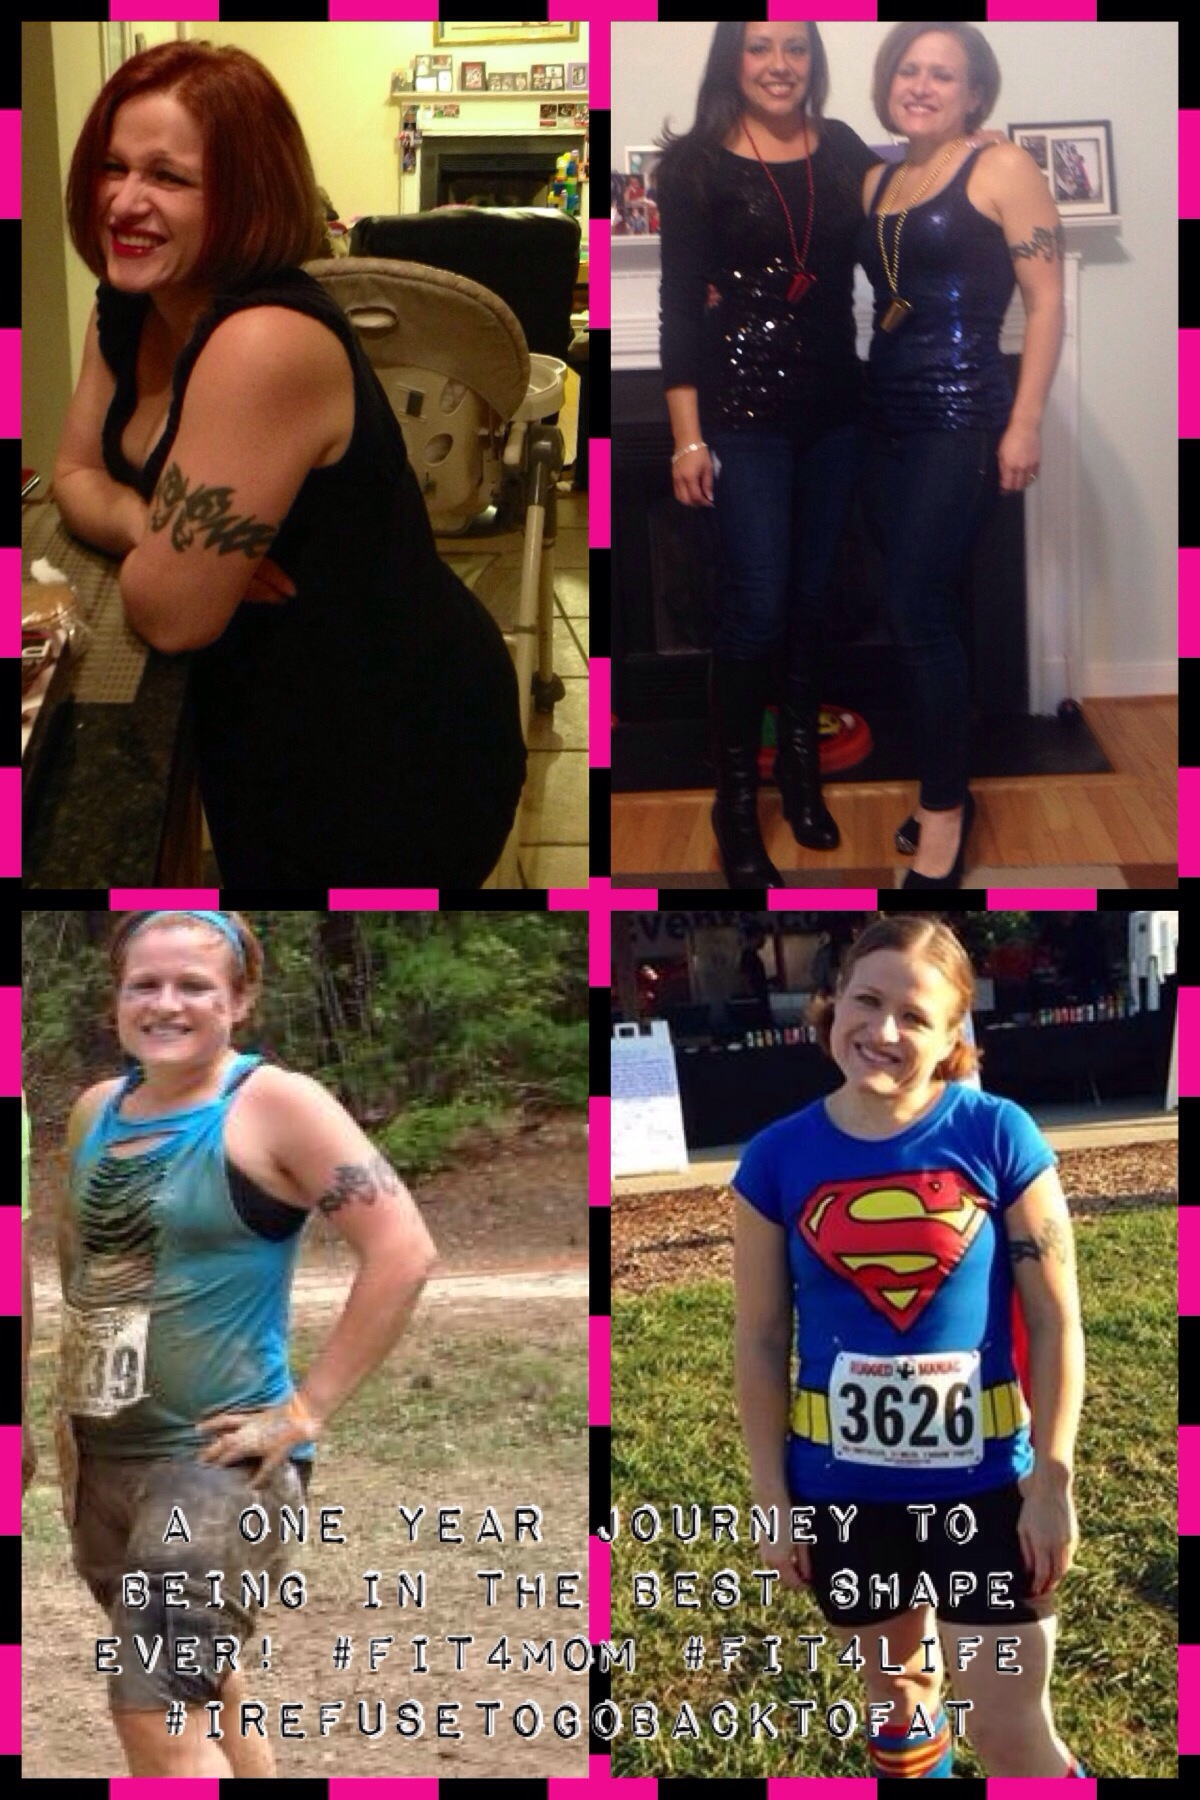 My one year journey tofitness